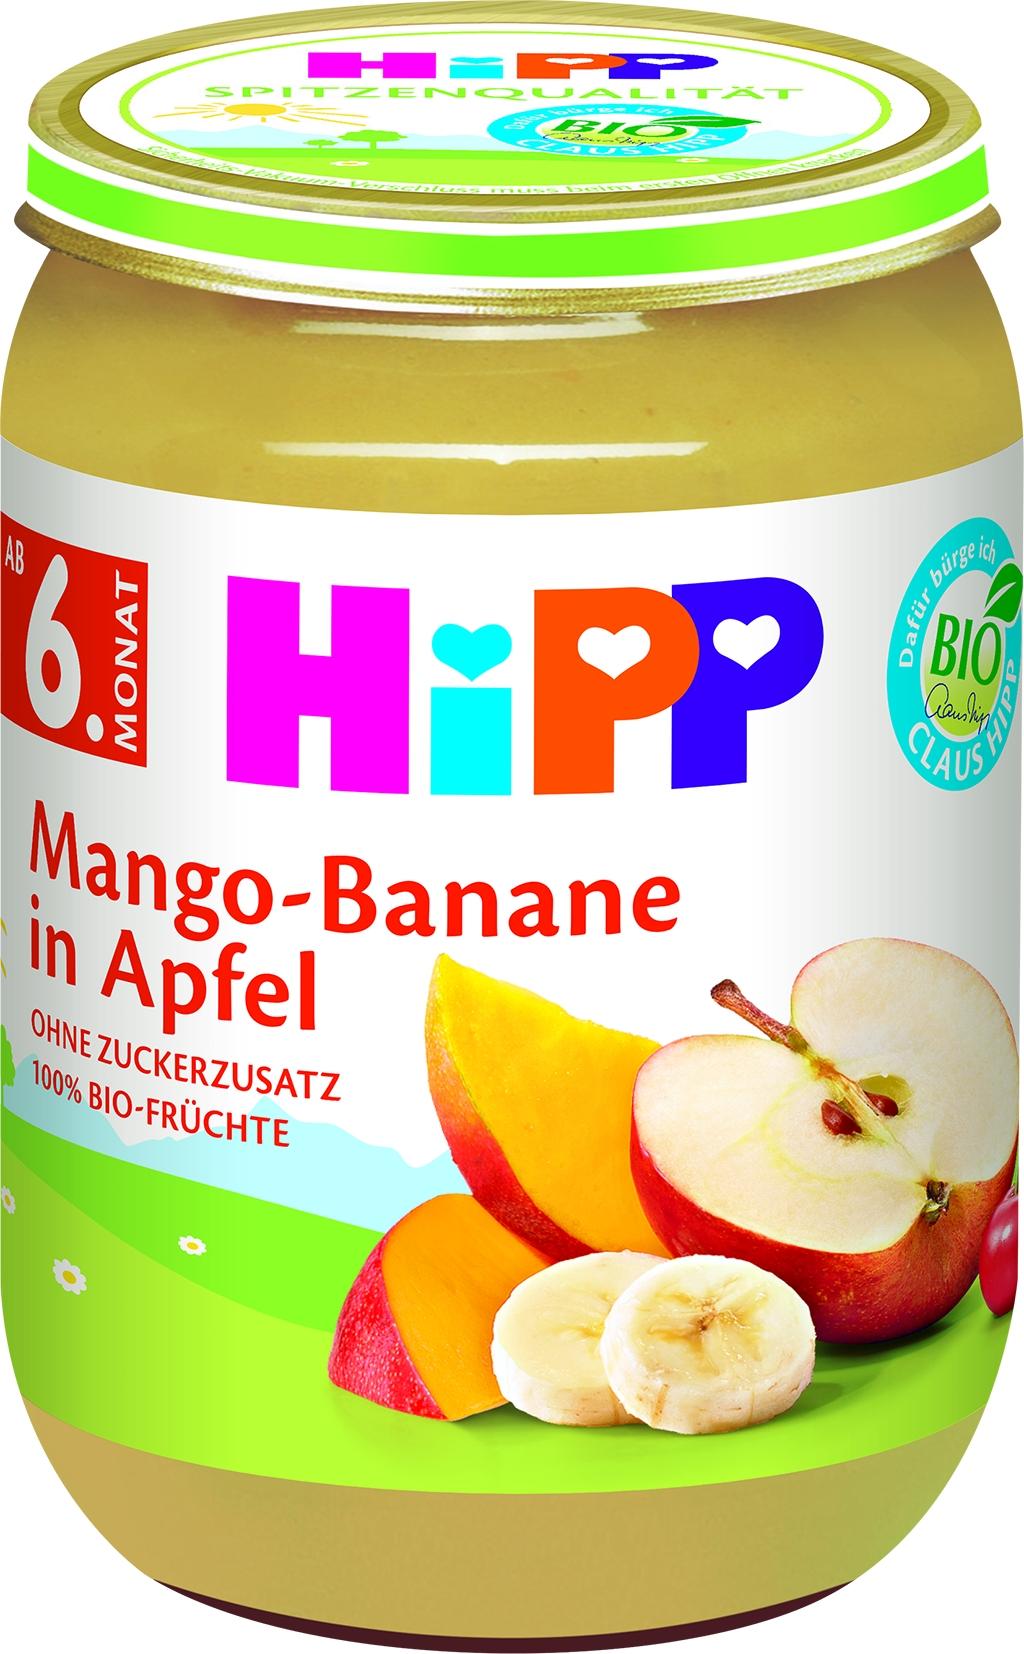 Bio 4397-02 Mango/Banane/Apfel